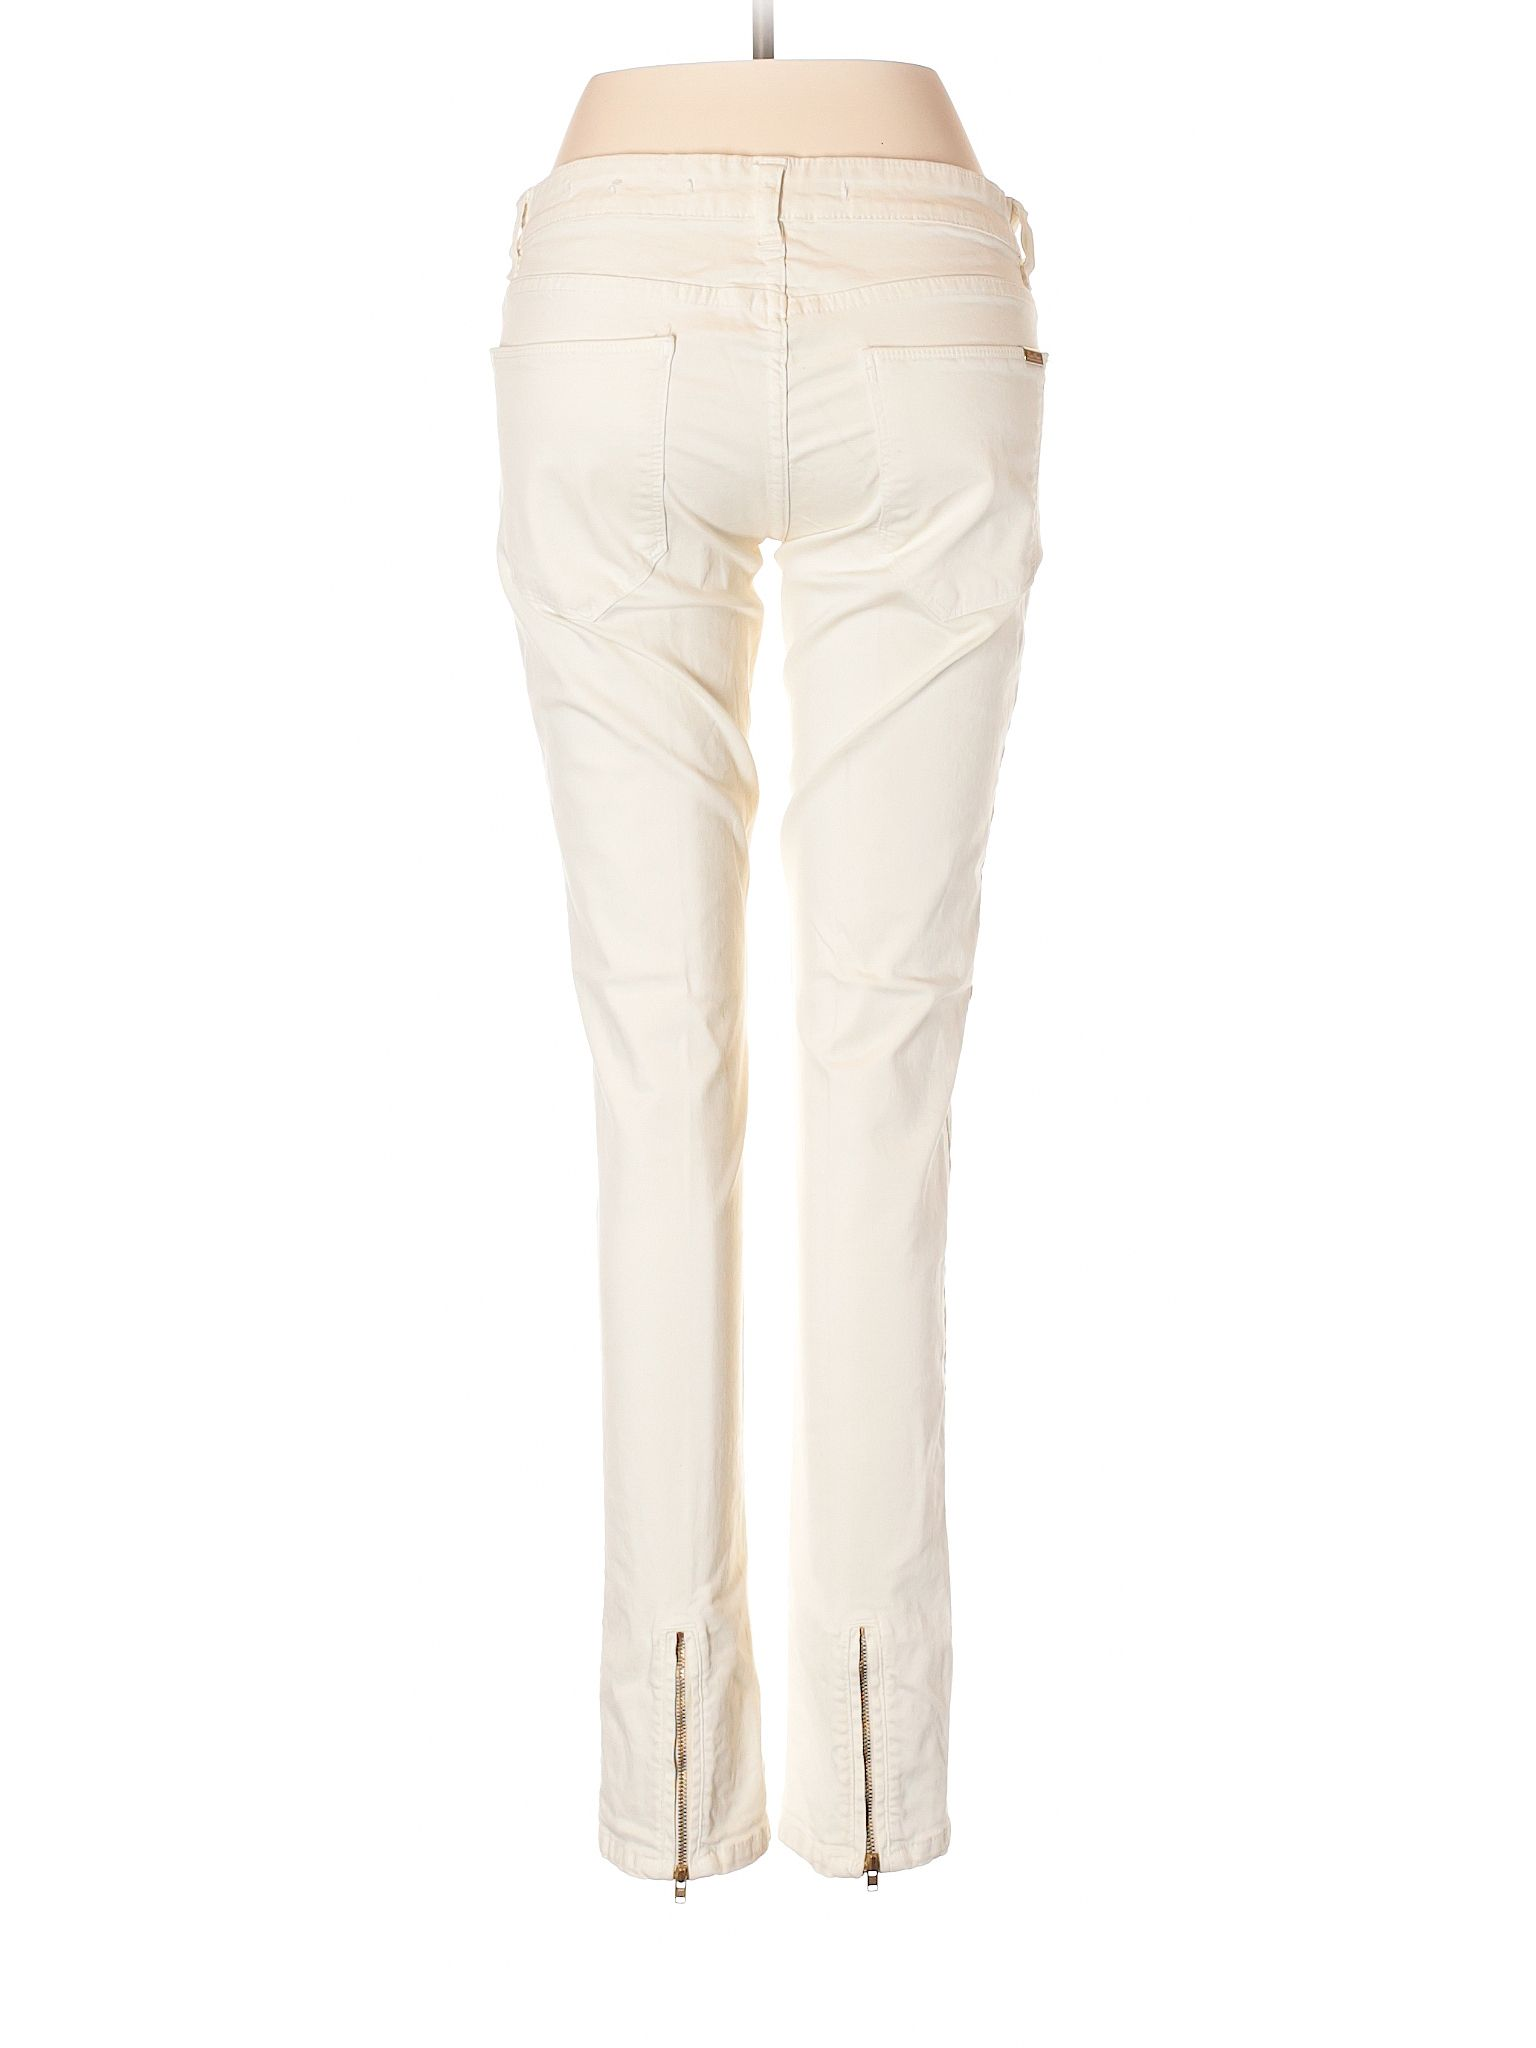 3f3e0133 Jeans | Products | Zara jeans, Jeans, Zara